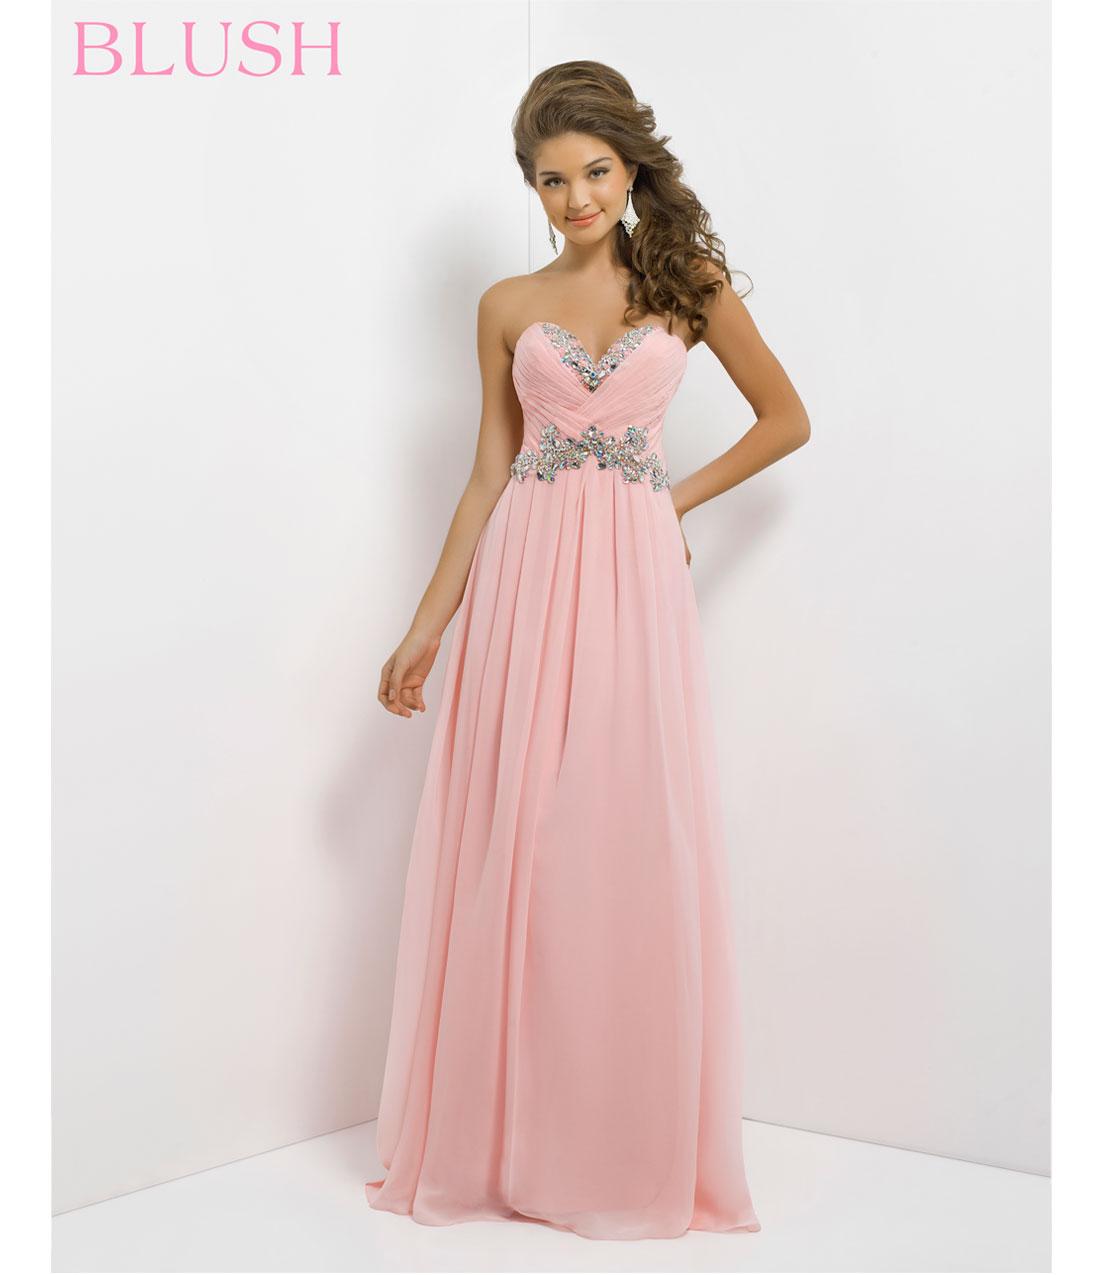 Blush Pink Prom Dress Photo Album - Reikian